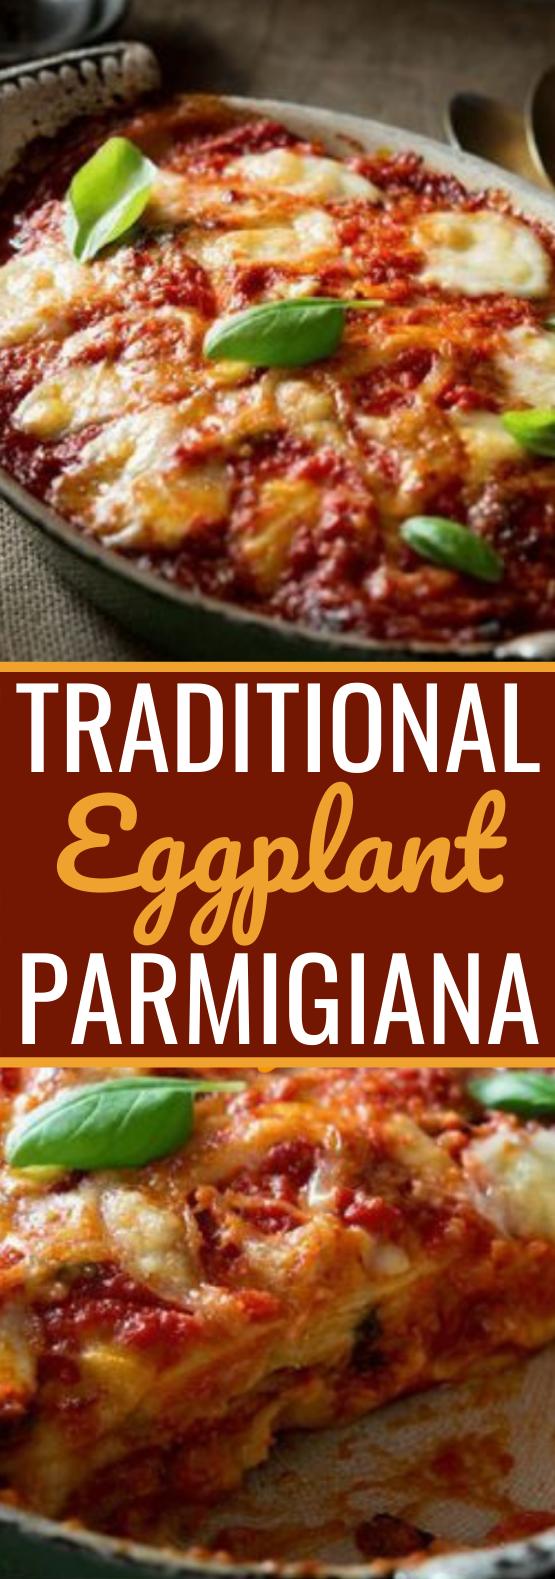 Parmigiana di Melanzane #dinner #italian #recipes #lasagna #weeknight